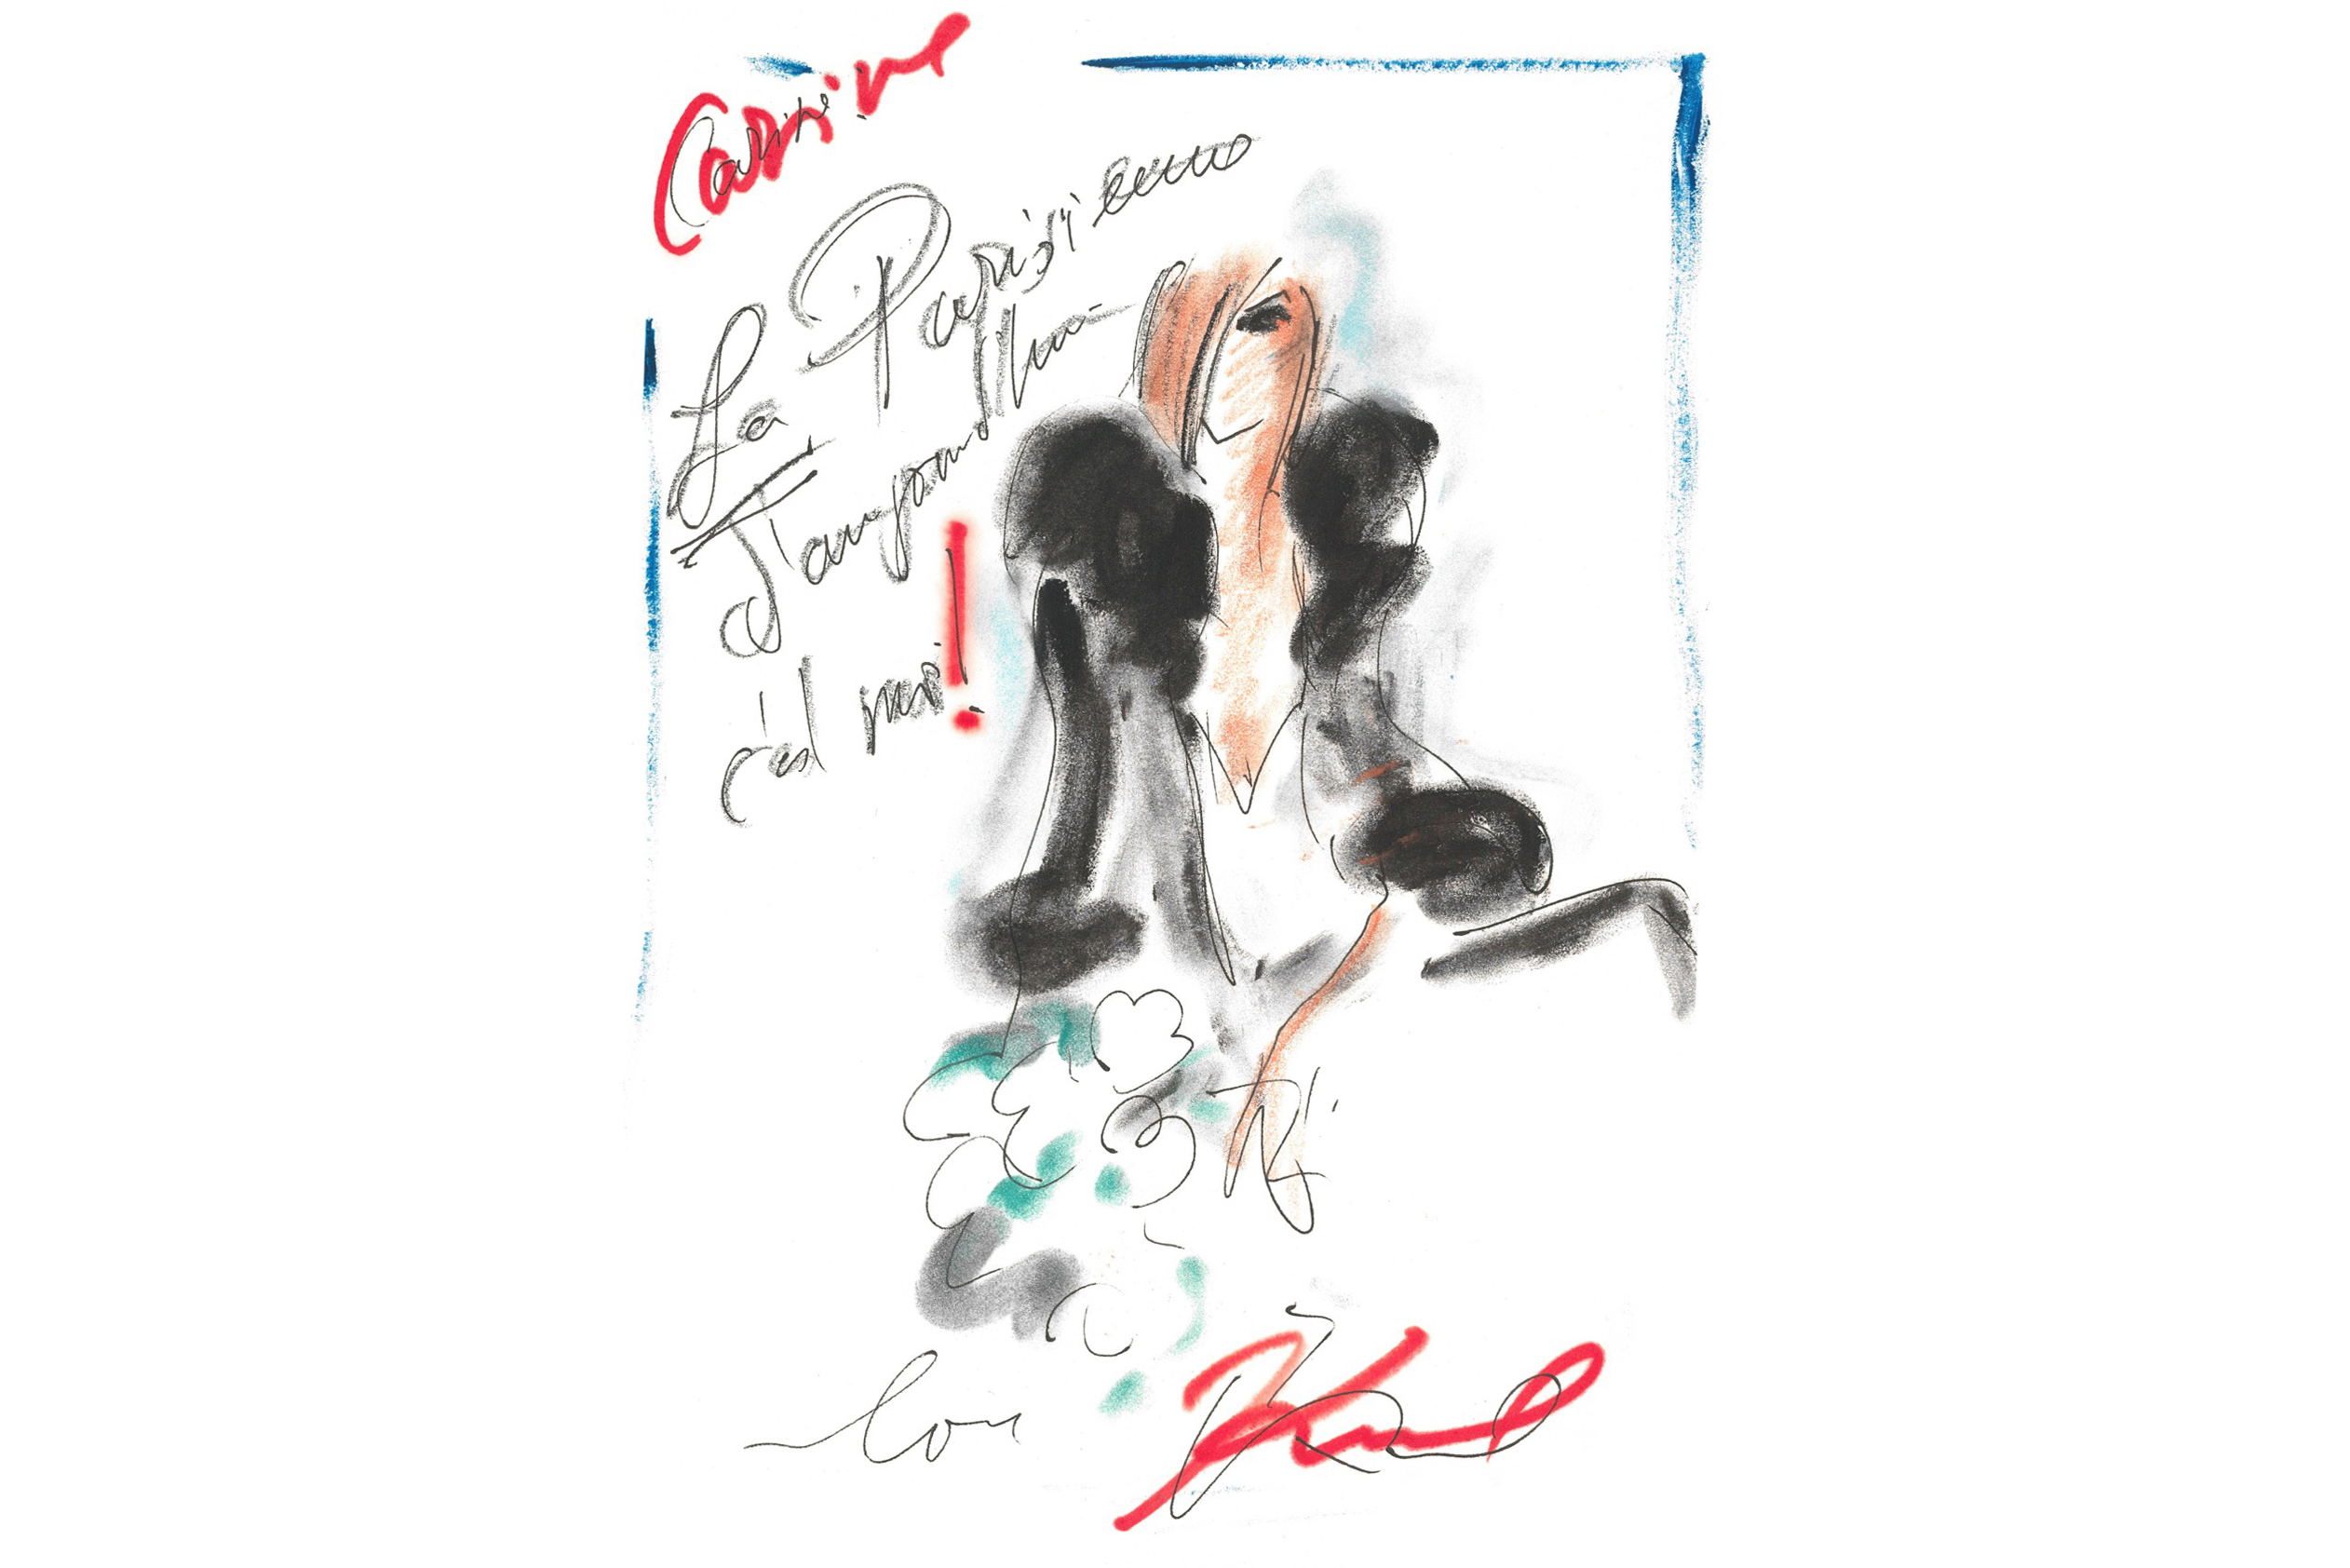 A Karl Lagerfeld sketch of Carine Roitfeld.